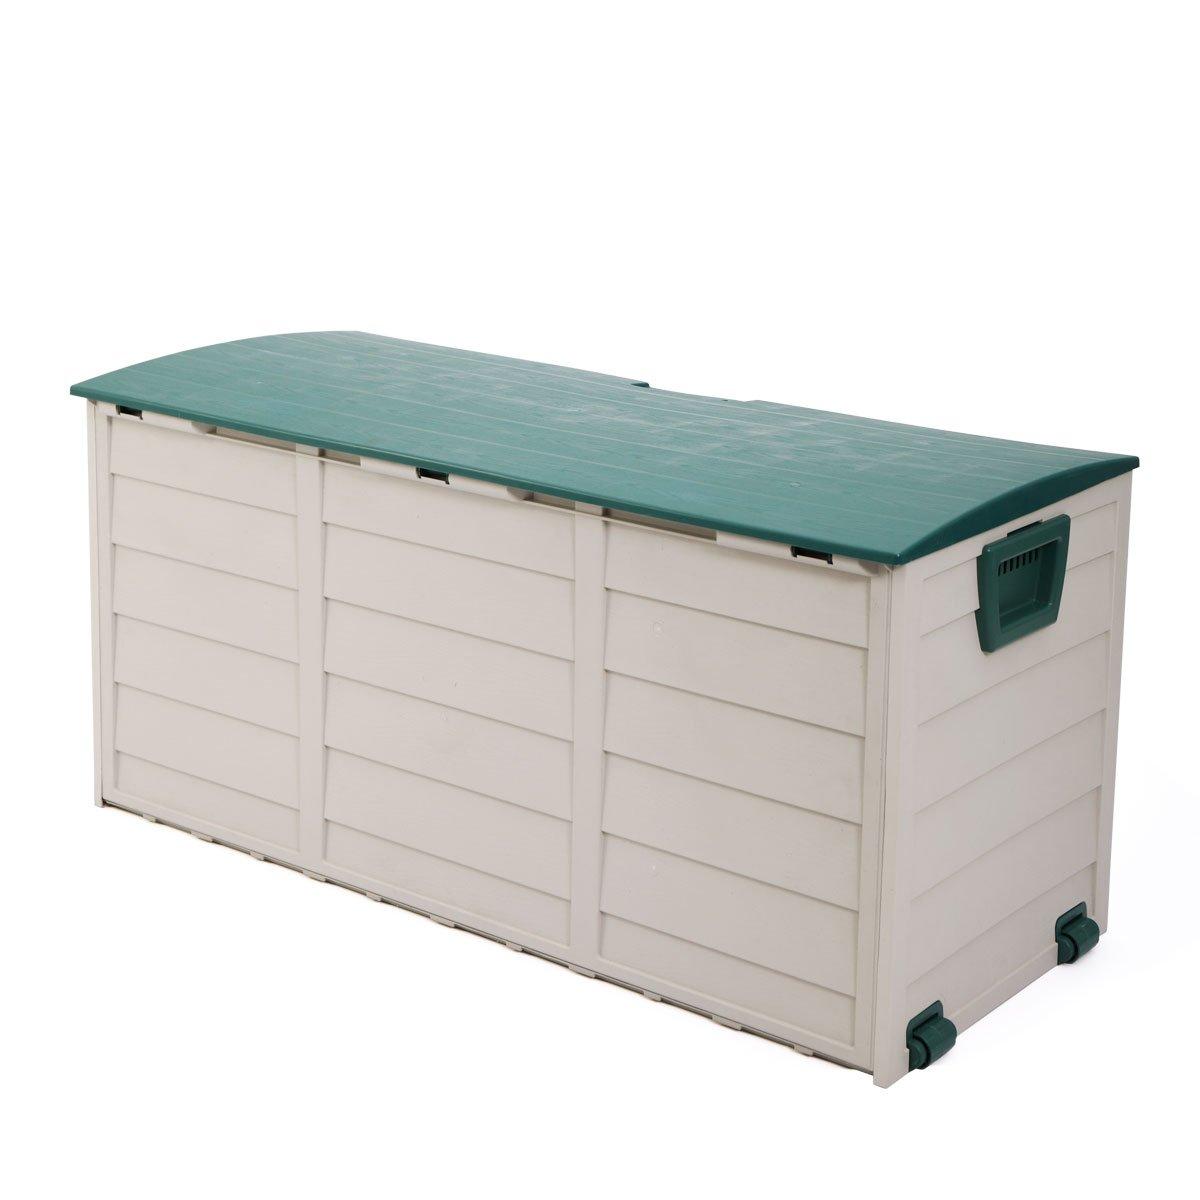 Tobbi Outdoor Patio Deck Storage Box Garage Shed Backyard Garden Tool Box Container